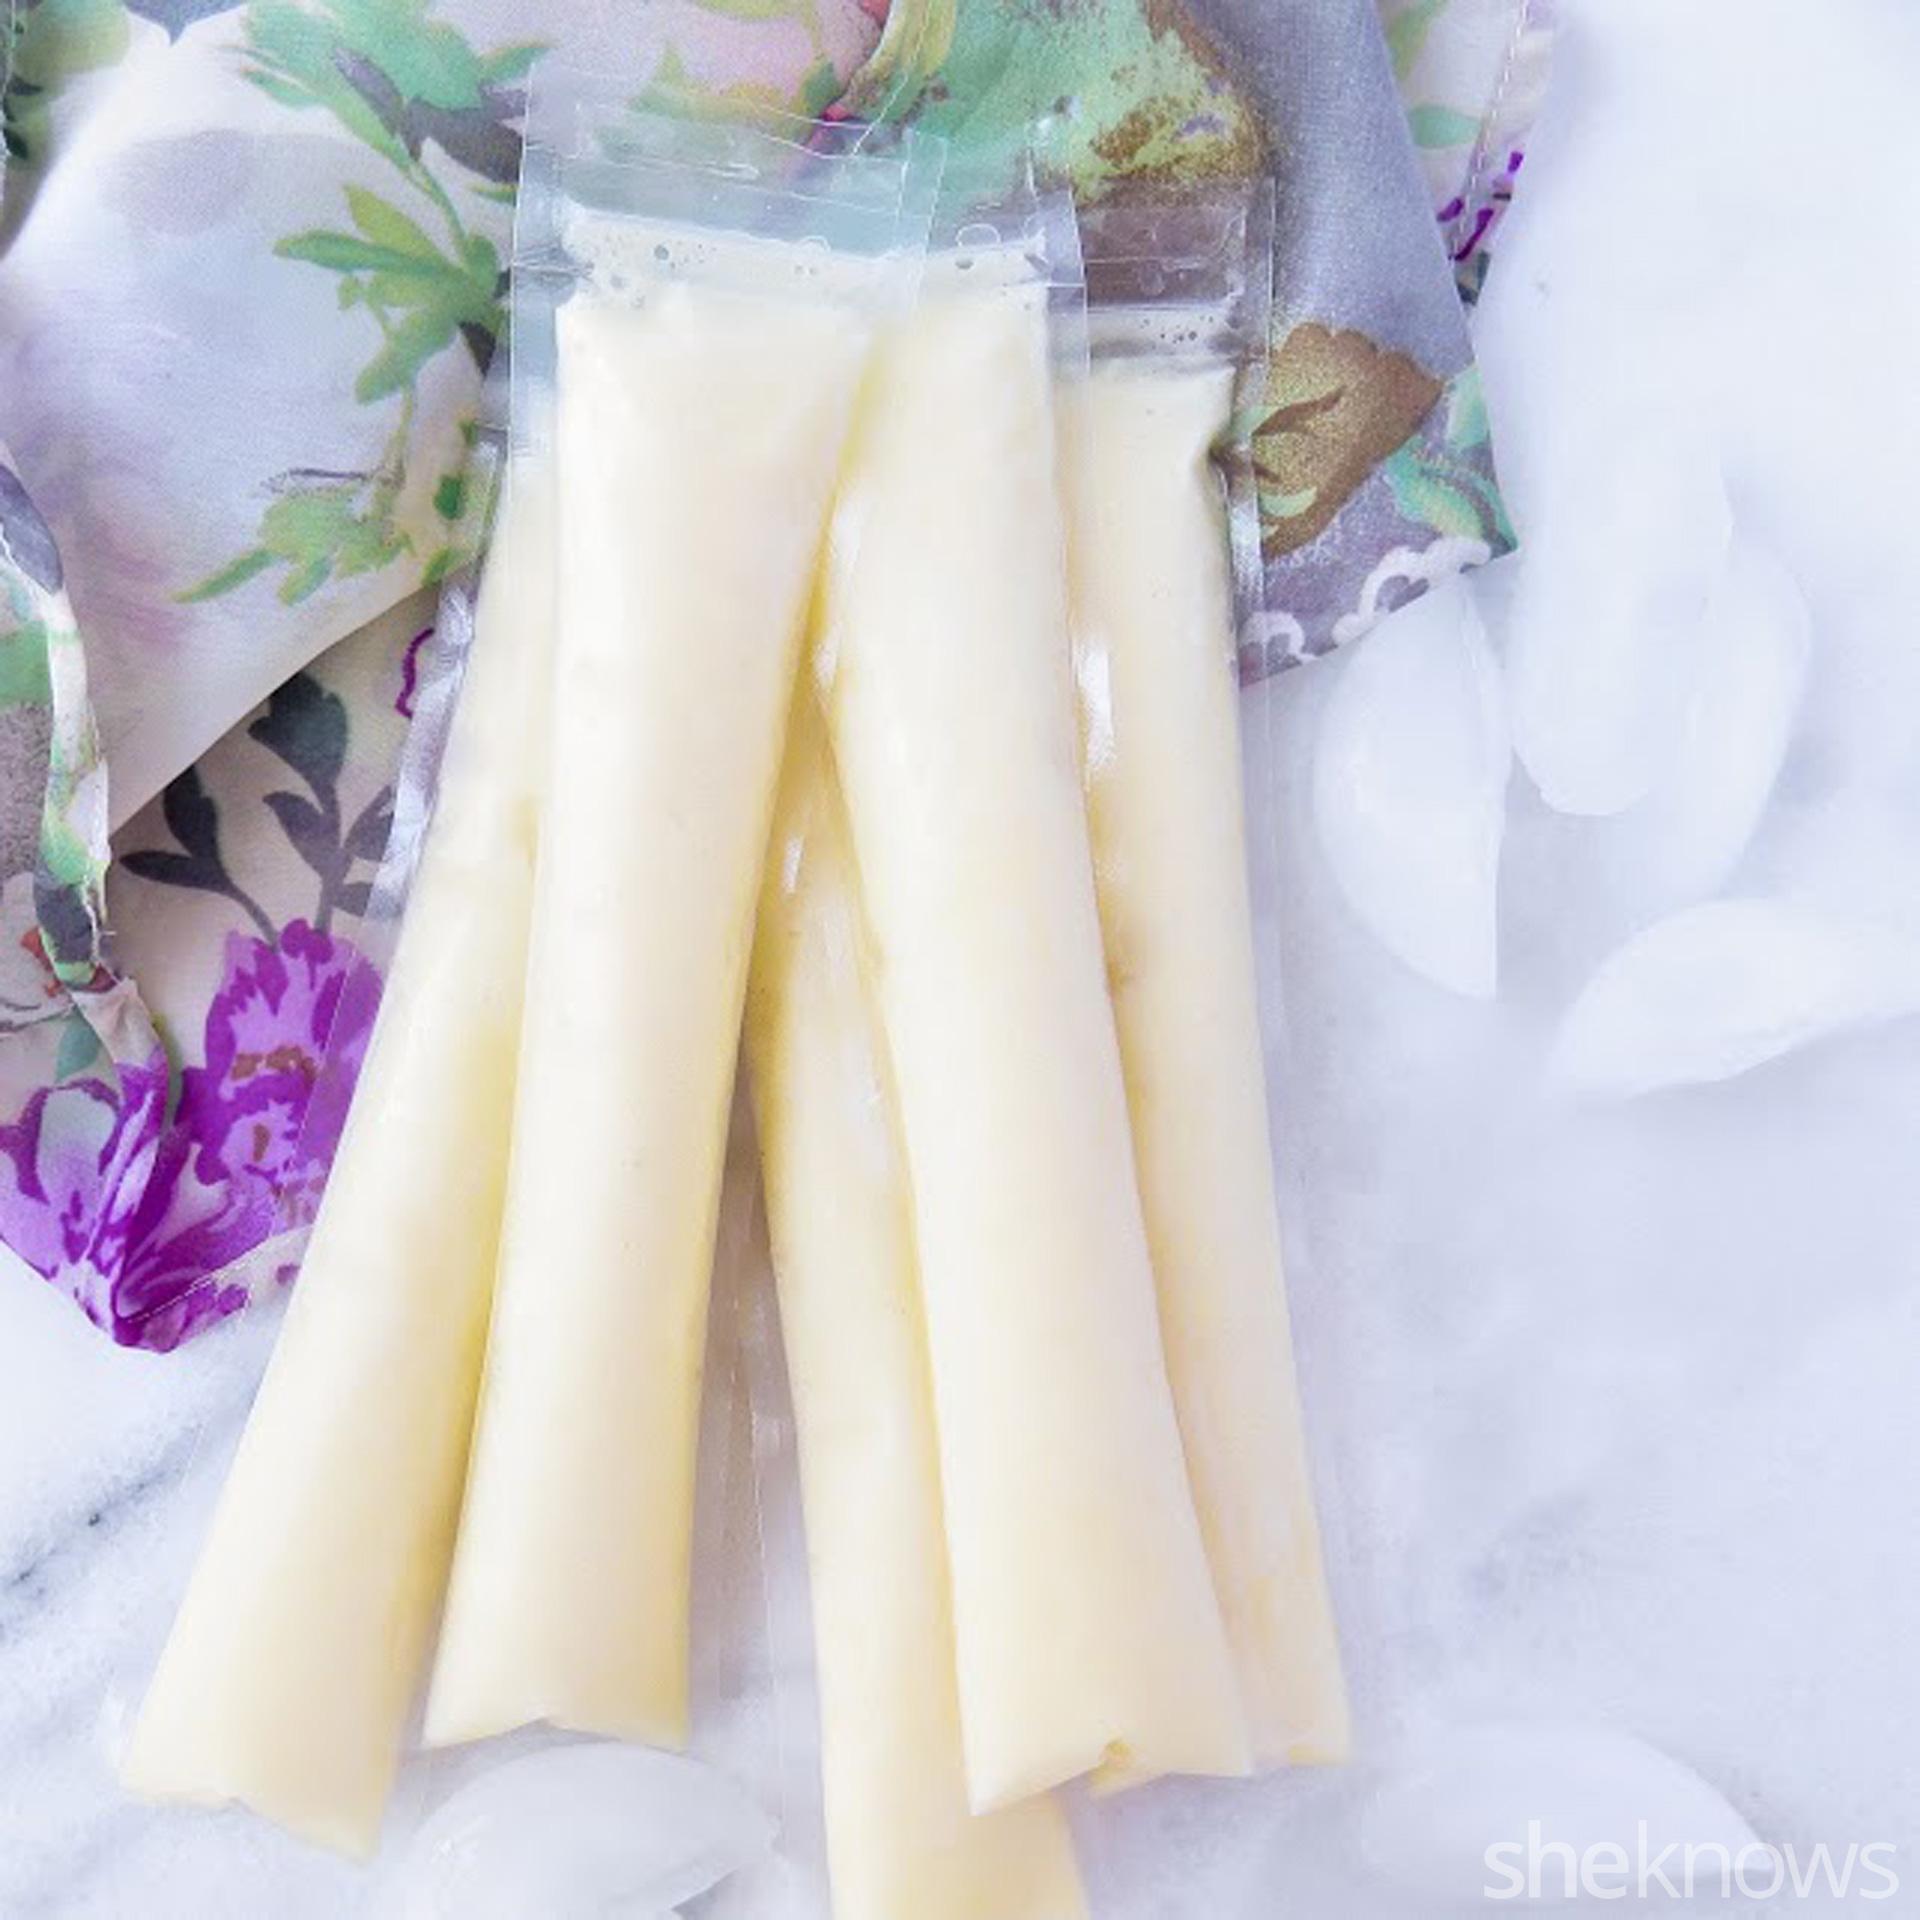 Pineapple whip ice pops